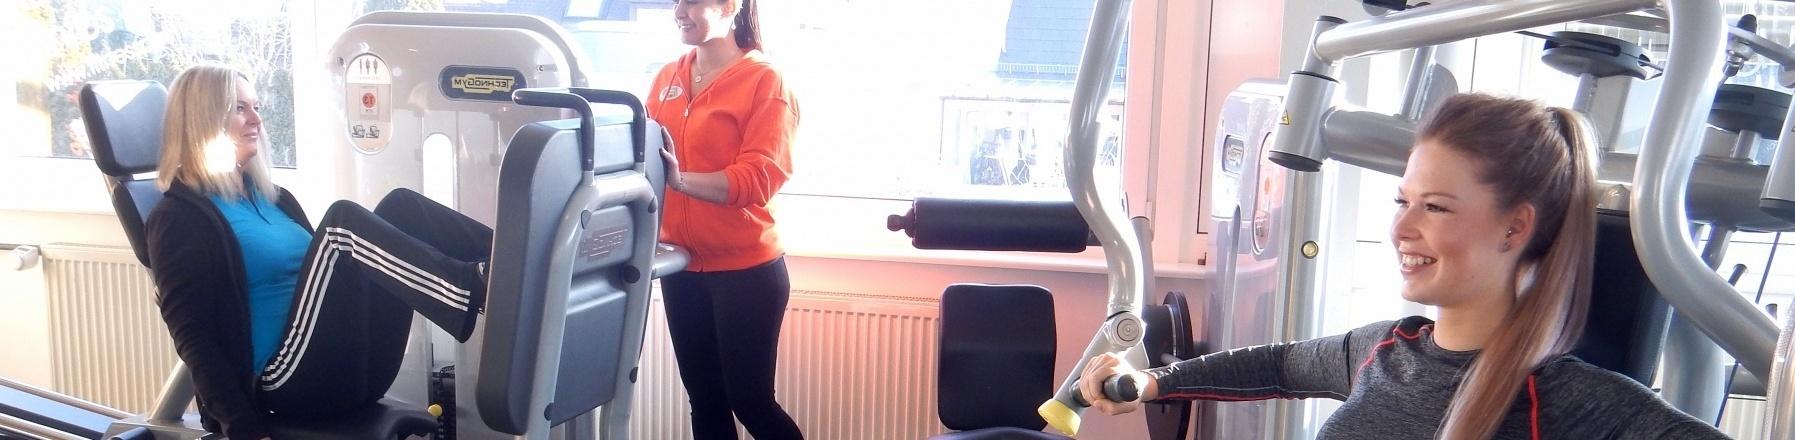 Frauen kennenlernen fitnessstudio